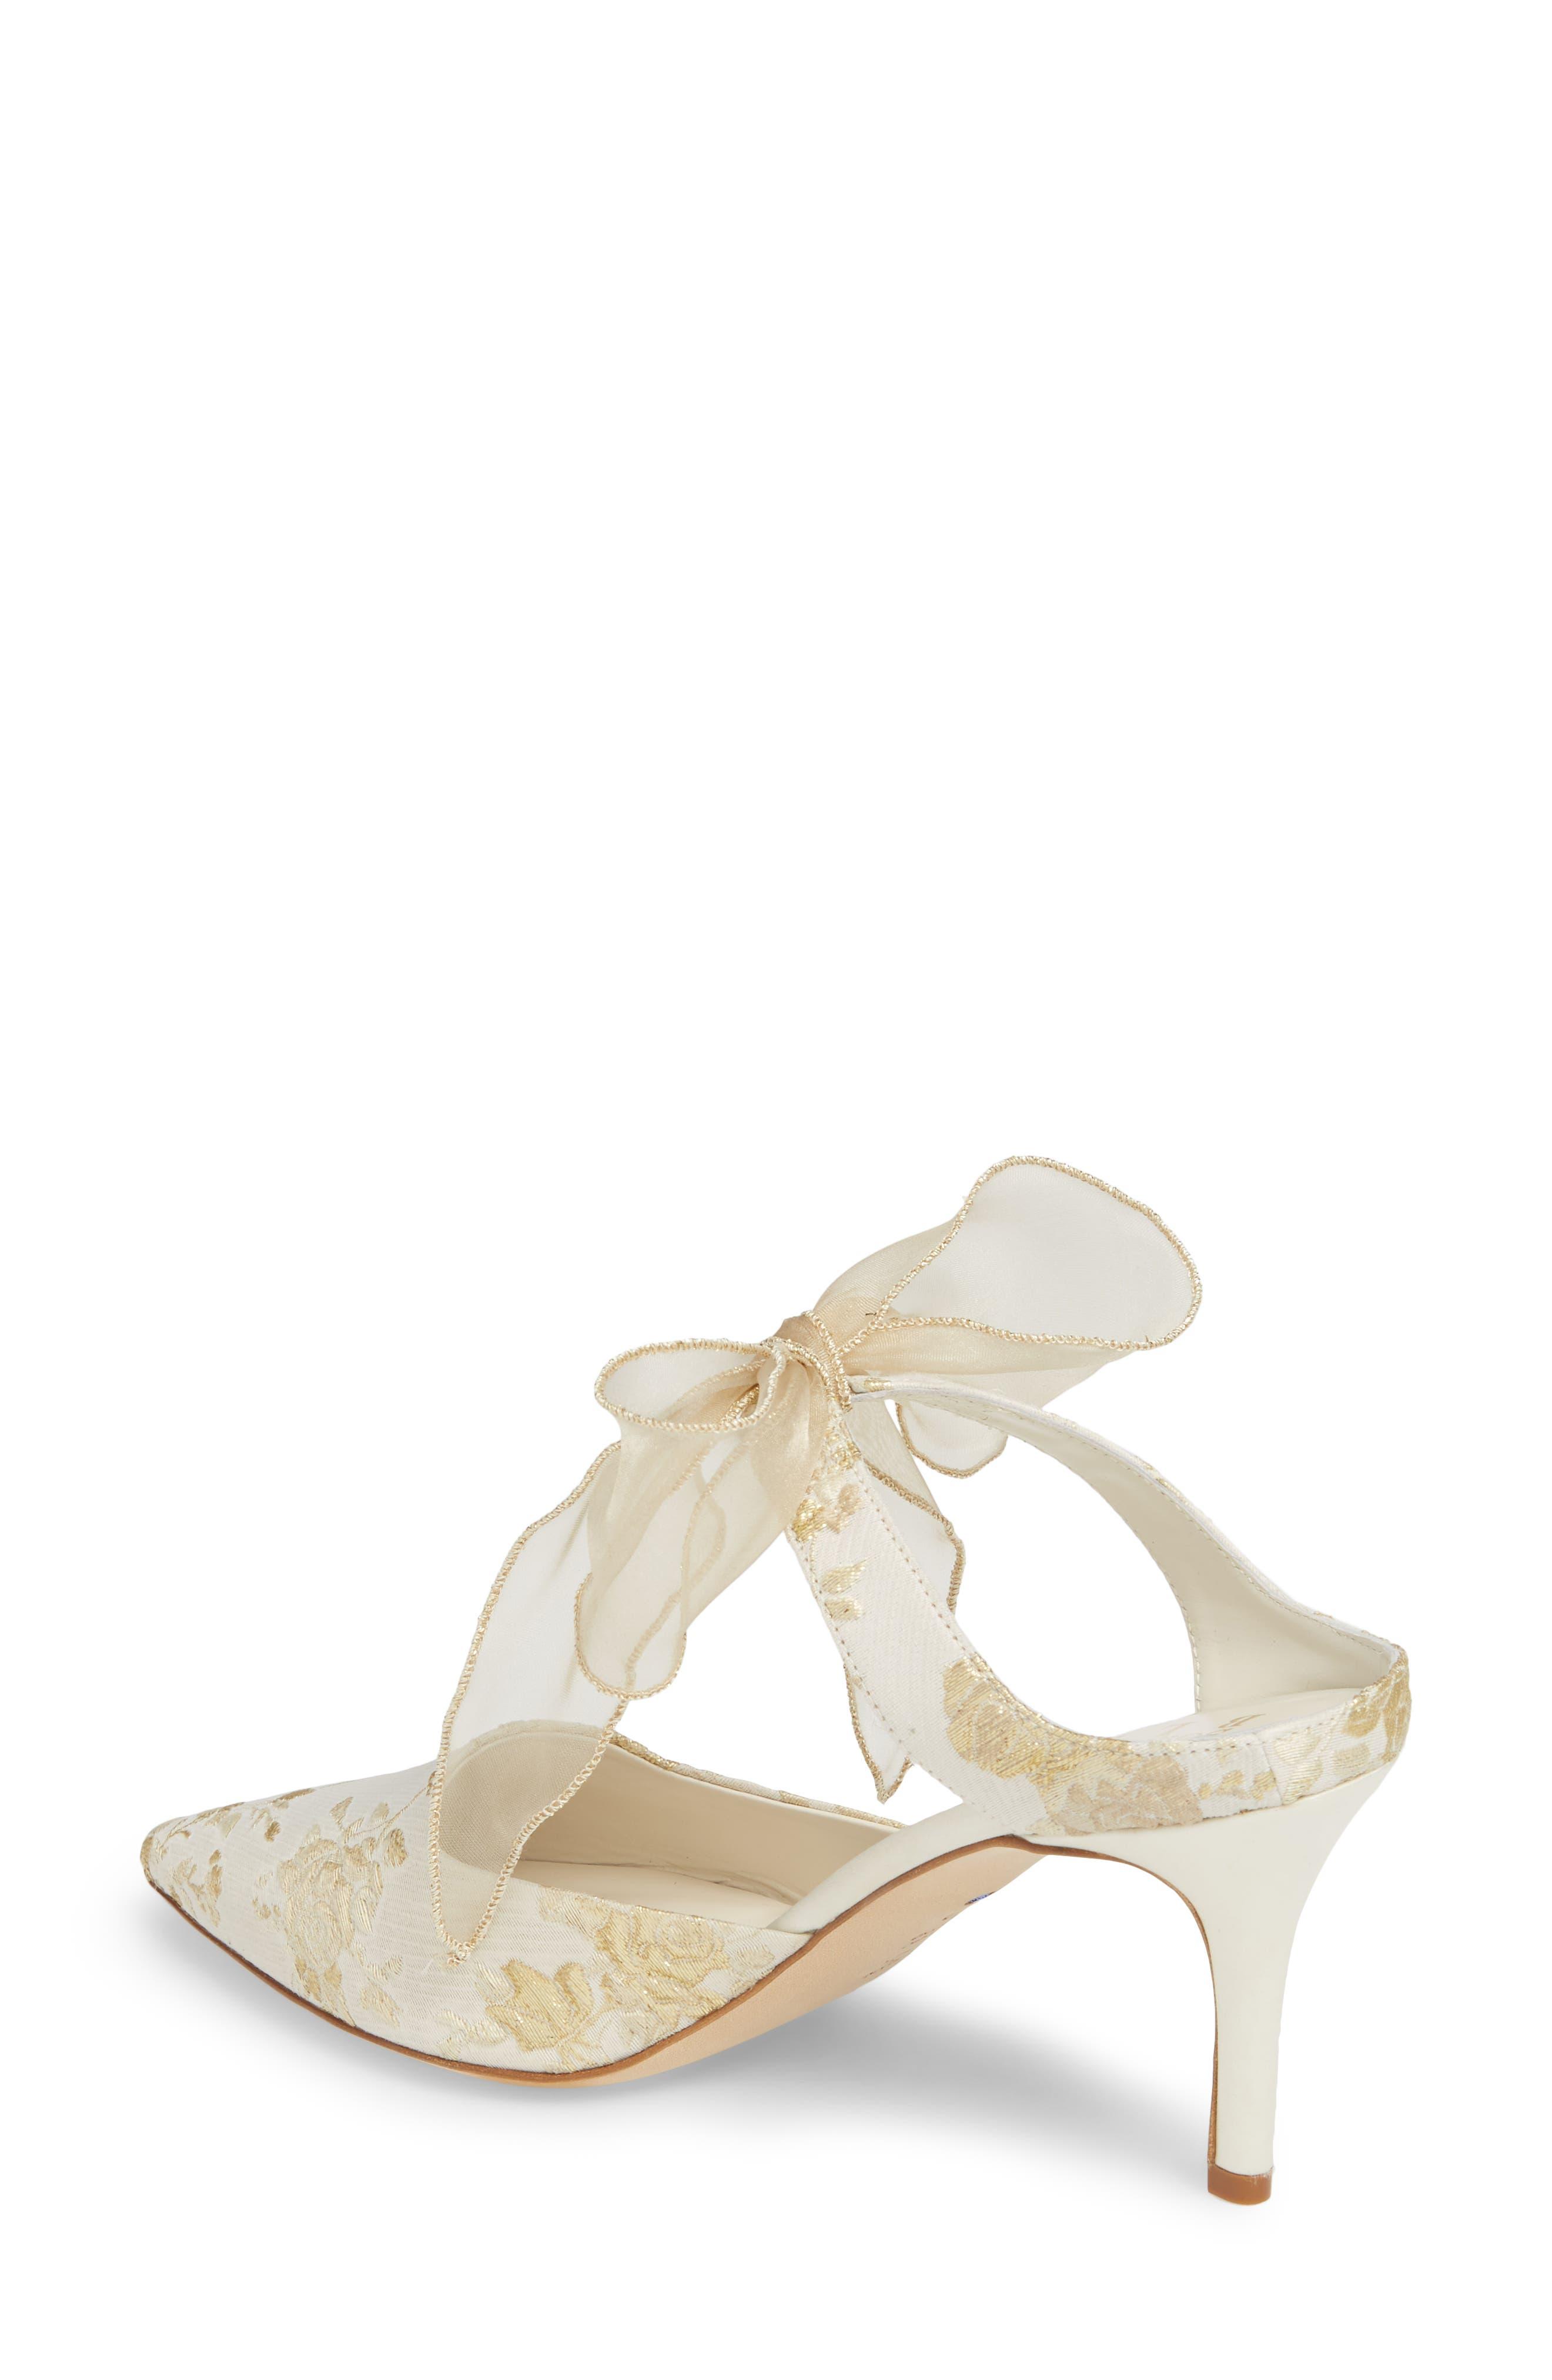 c516189641c Women's Something Bleu Shoes | Nordstrom